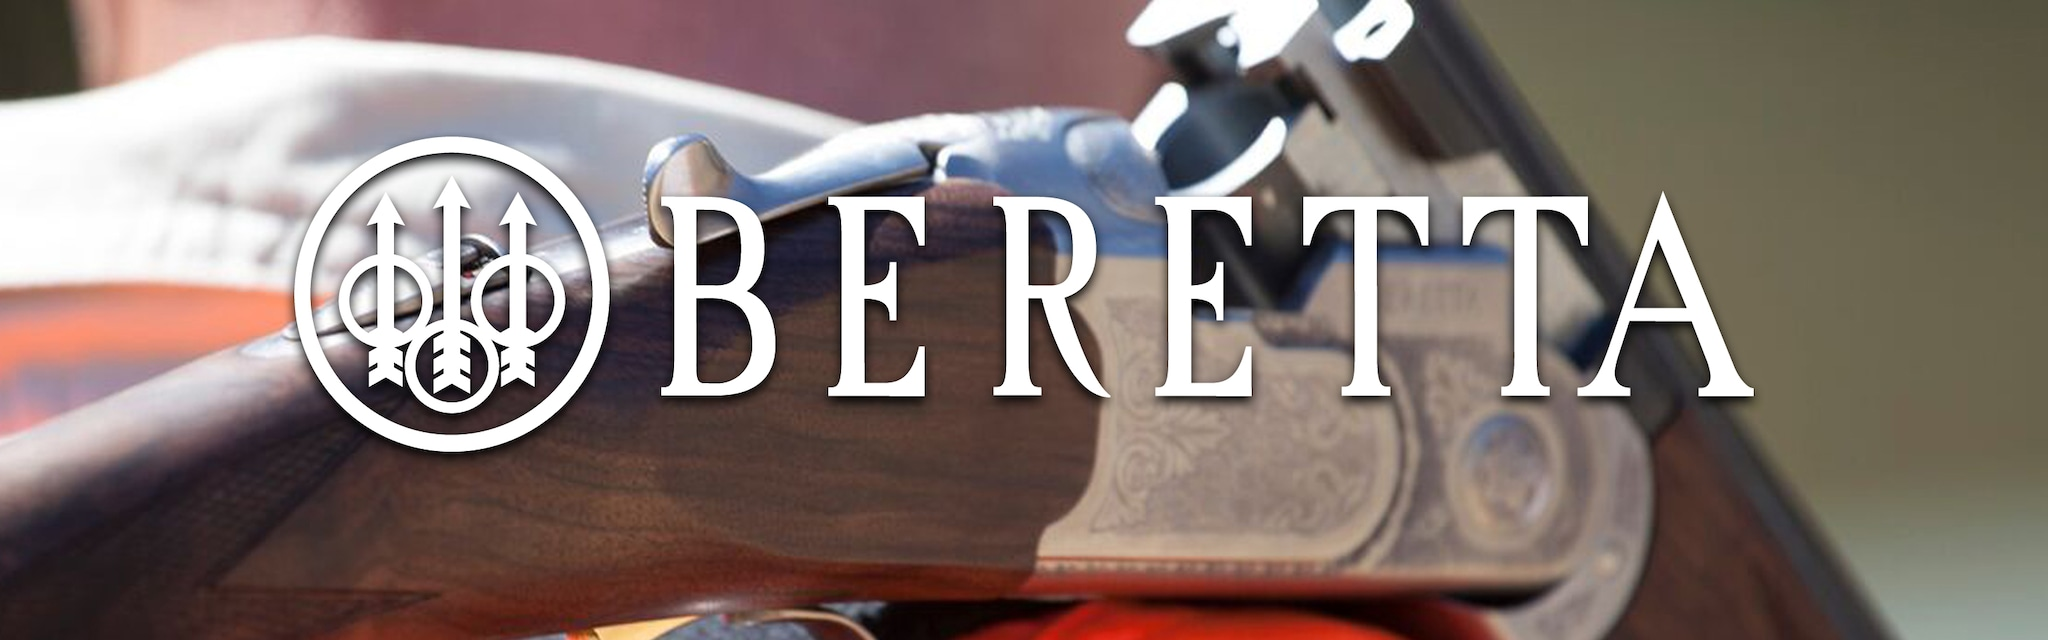 Beretta Brand Page